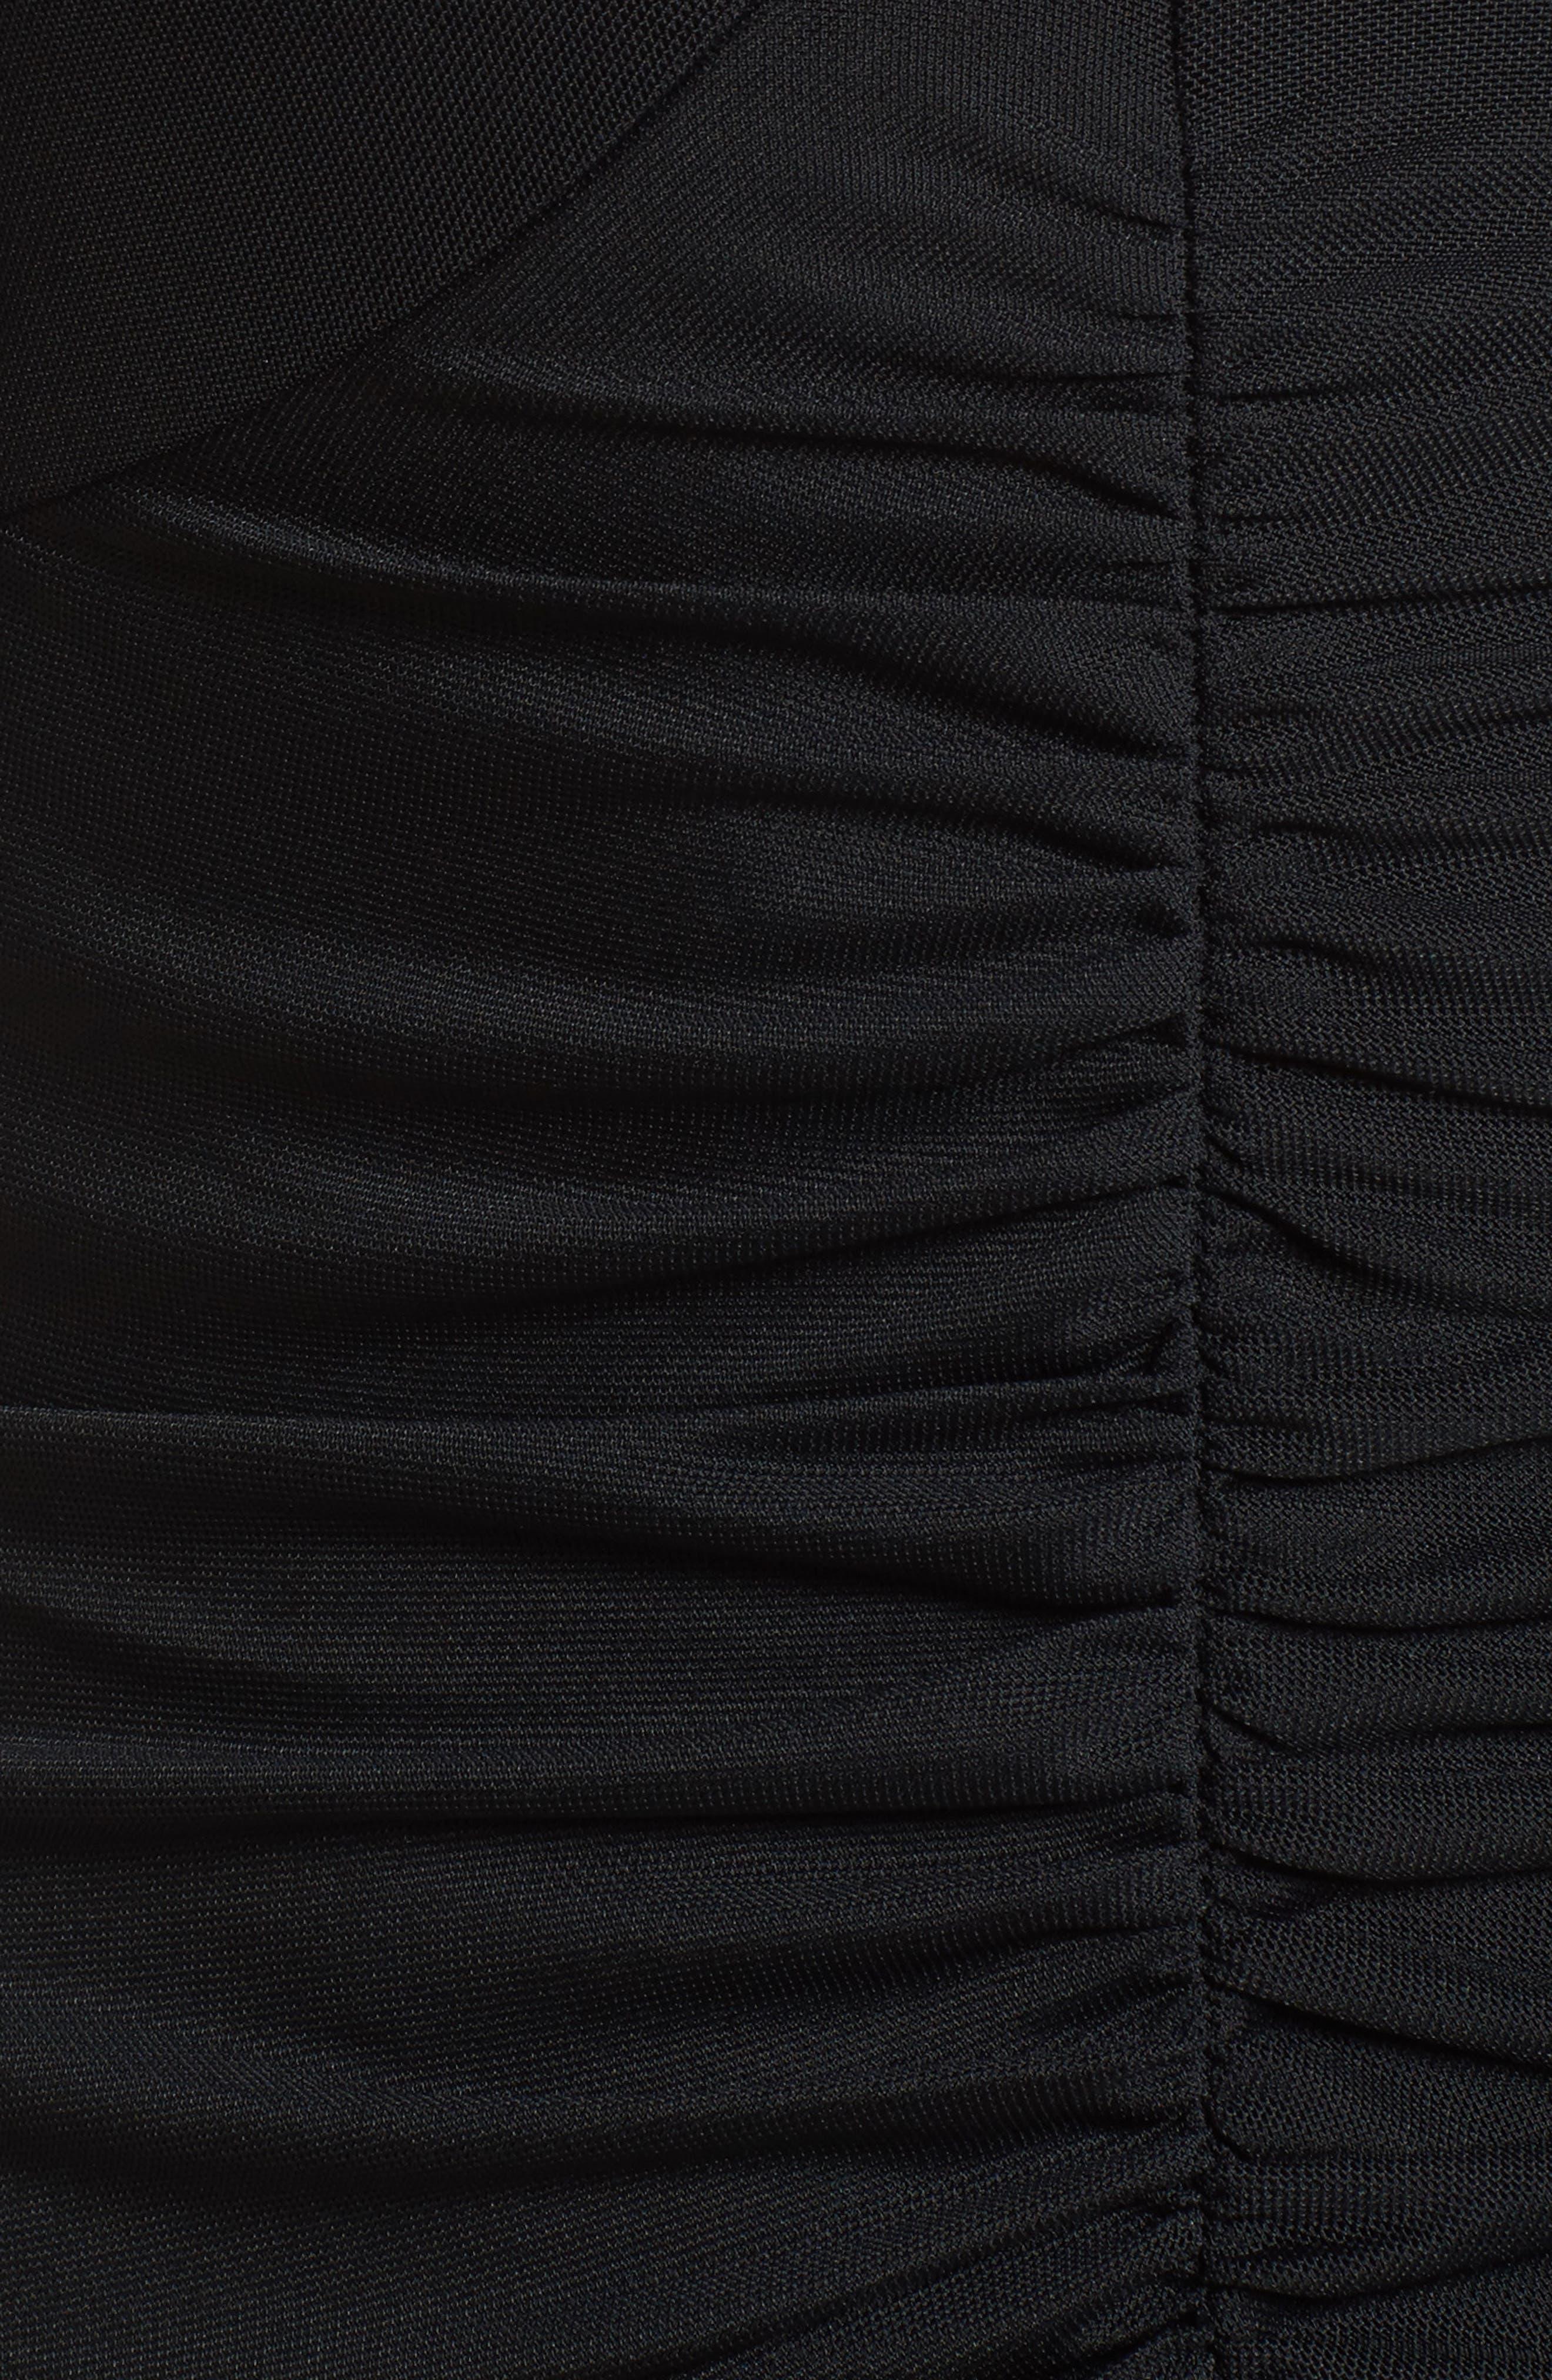 Body-Con Sheath Dress,                             Alternate thumbnail 5, color,                             Black